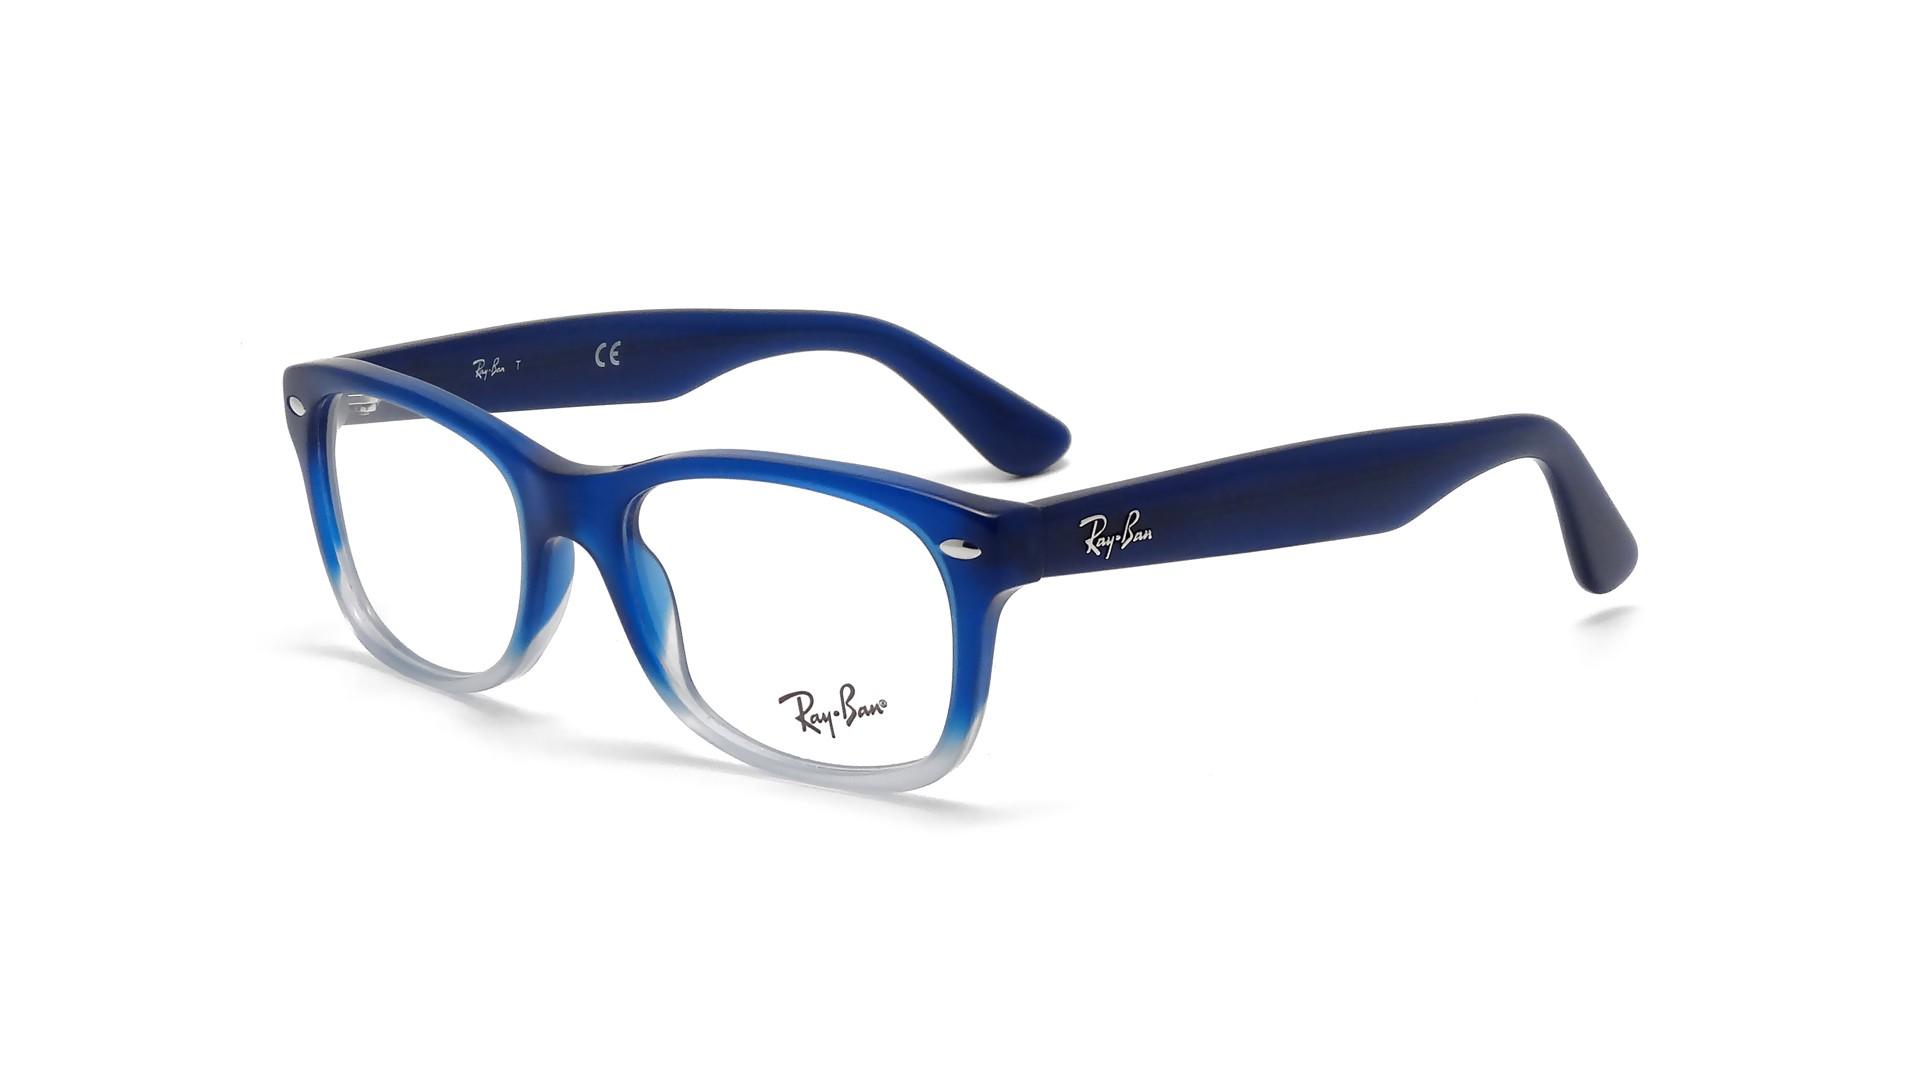 lunette de vue ray ban bleu marine